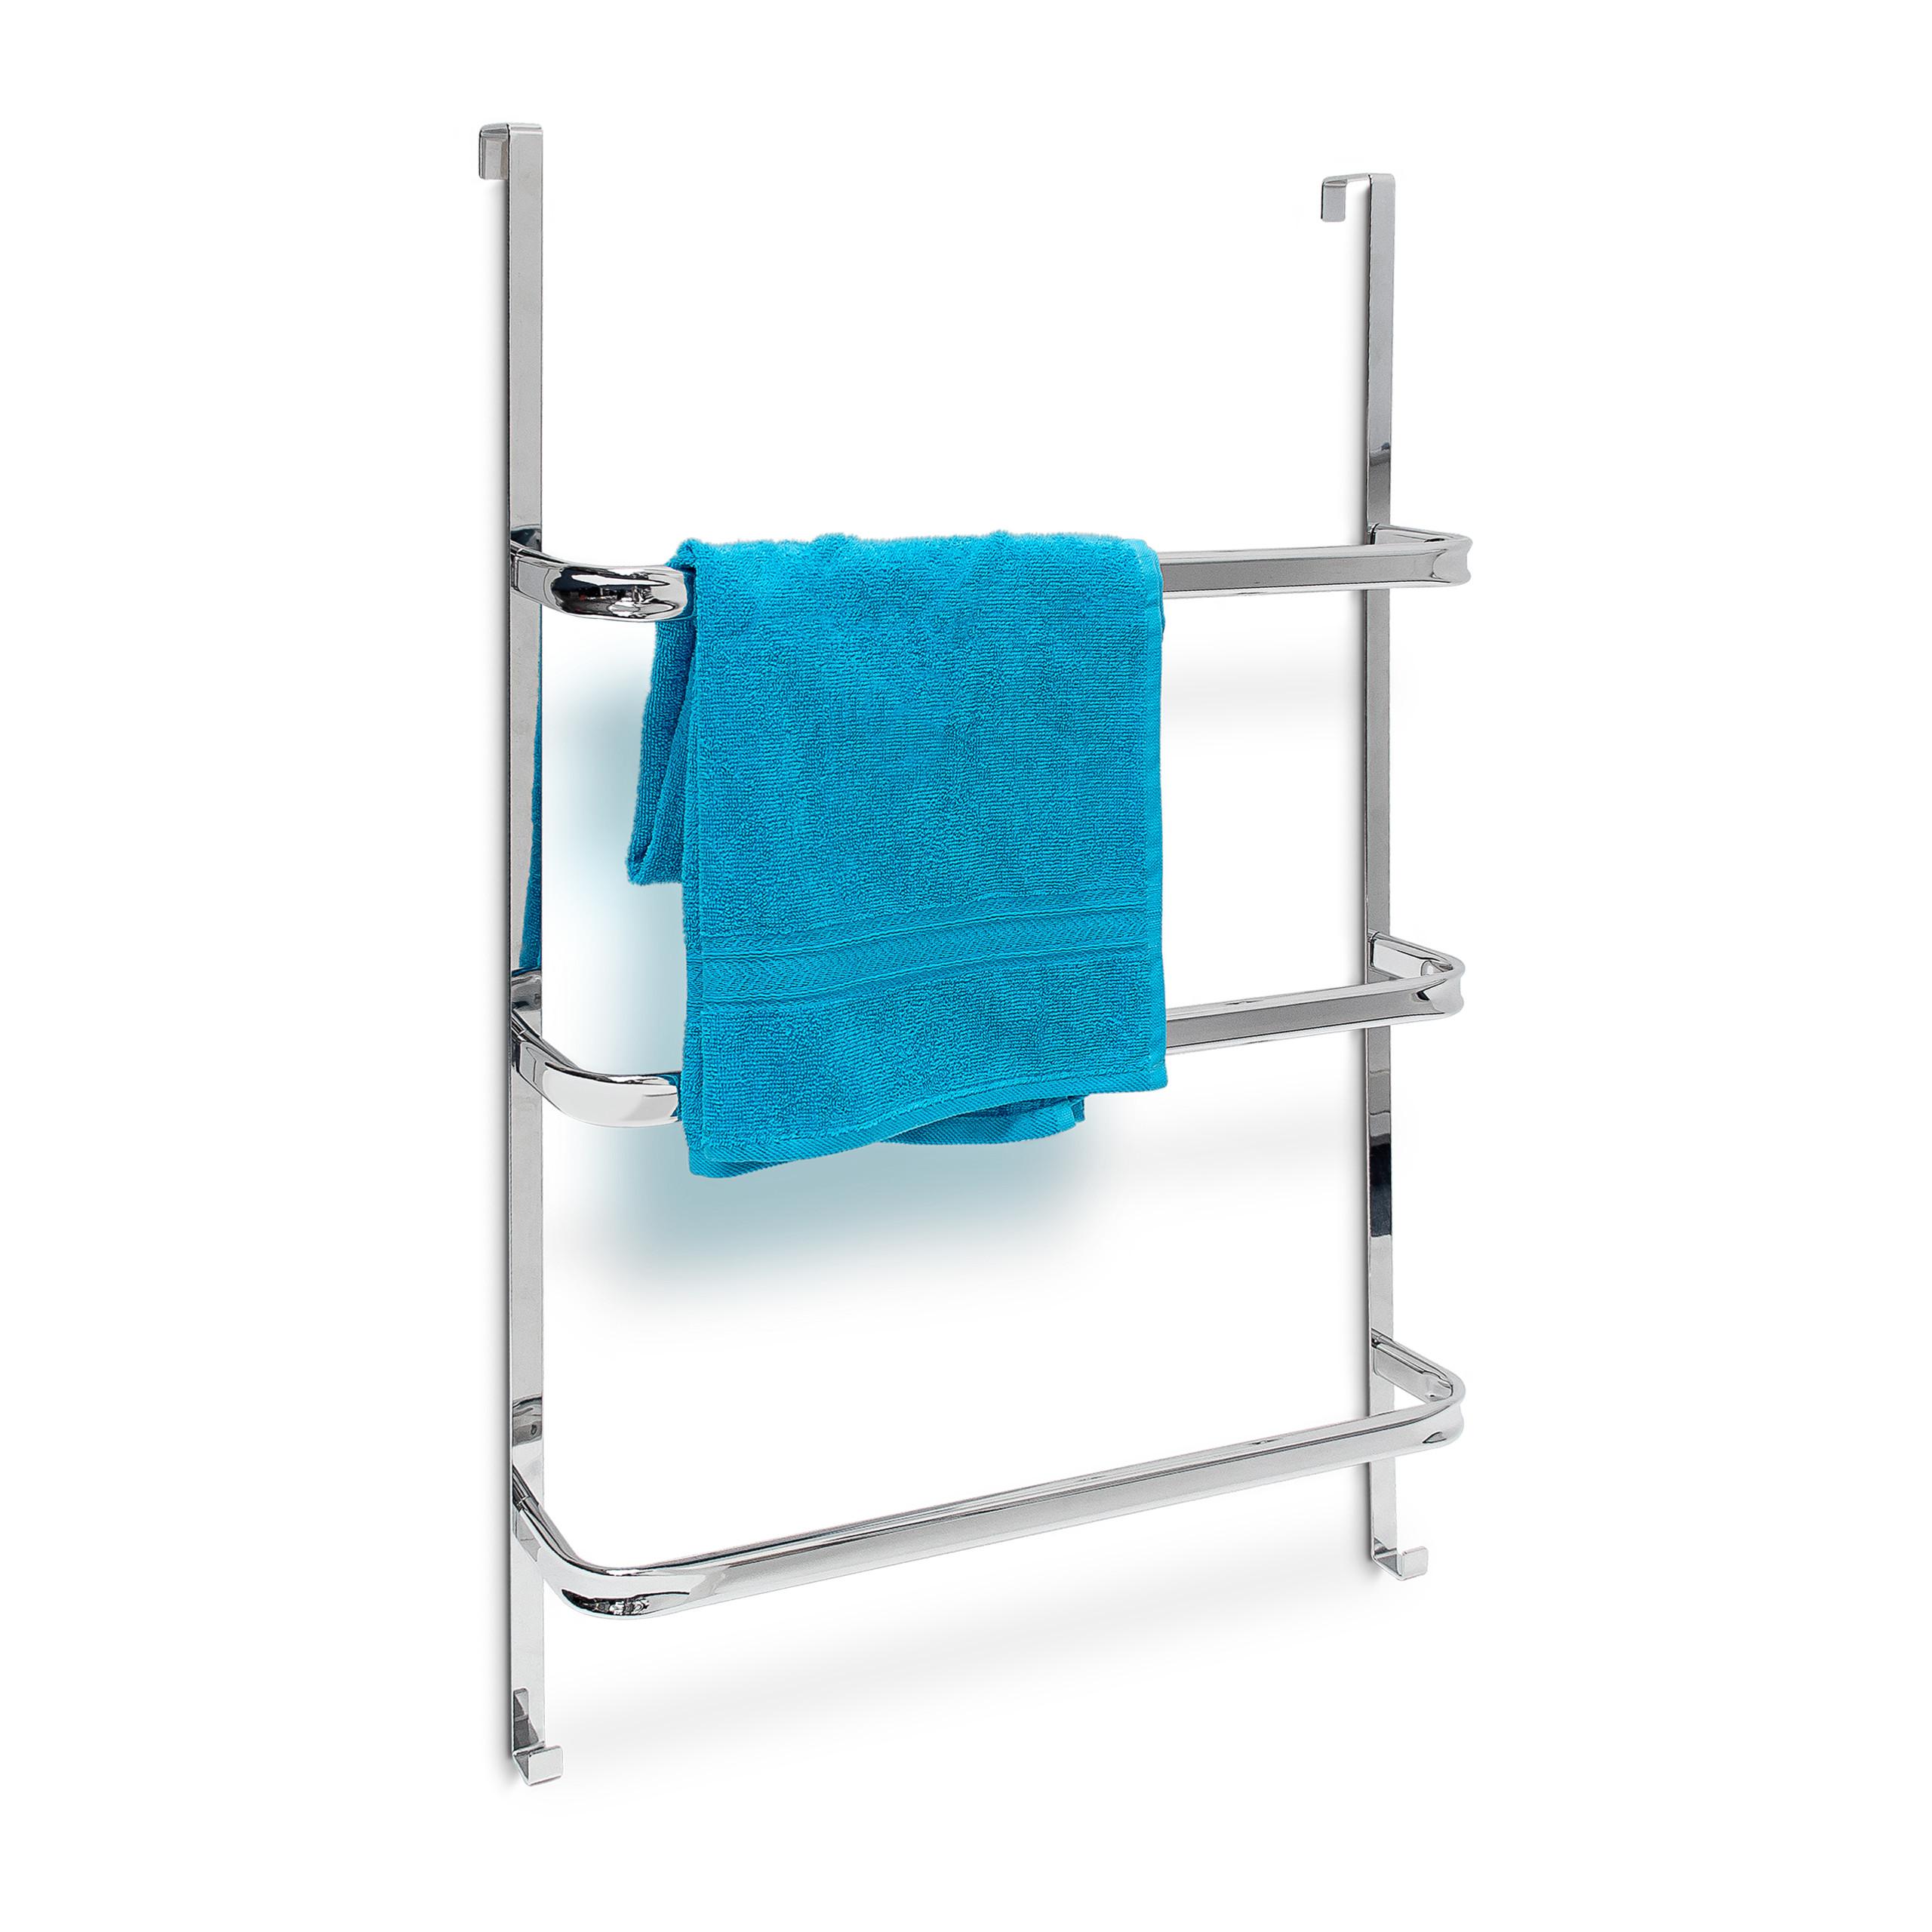 Handtuchhalter Tür Edelstahl 3 Stangen Handtuchhaken